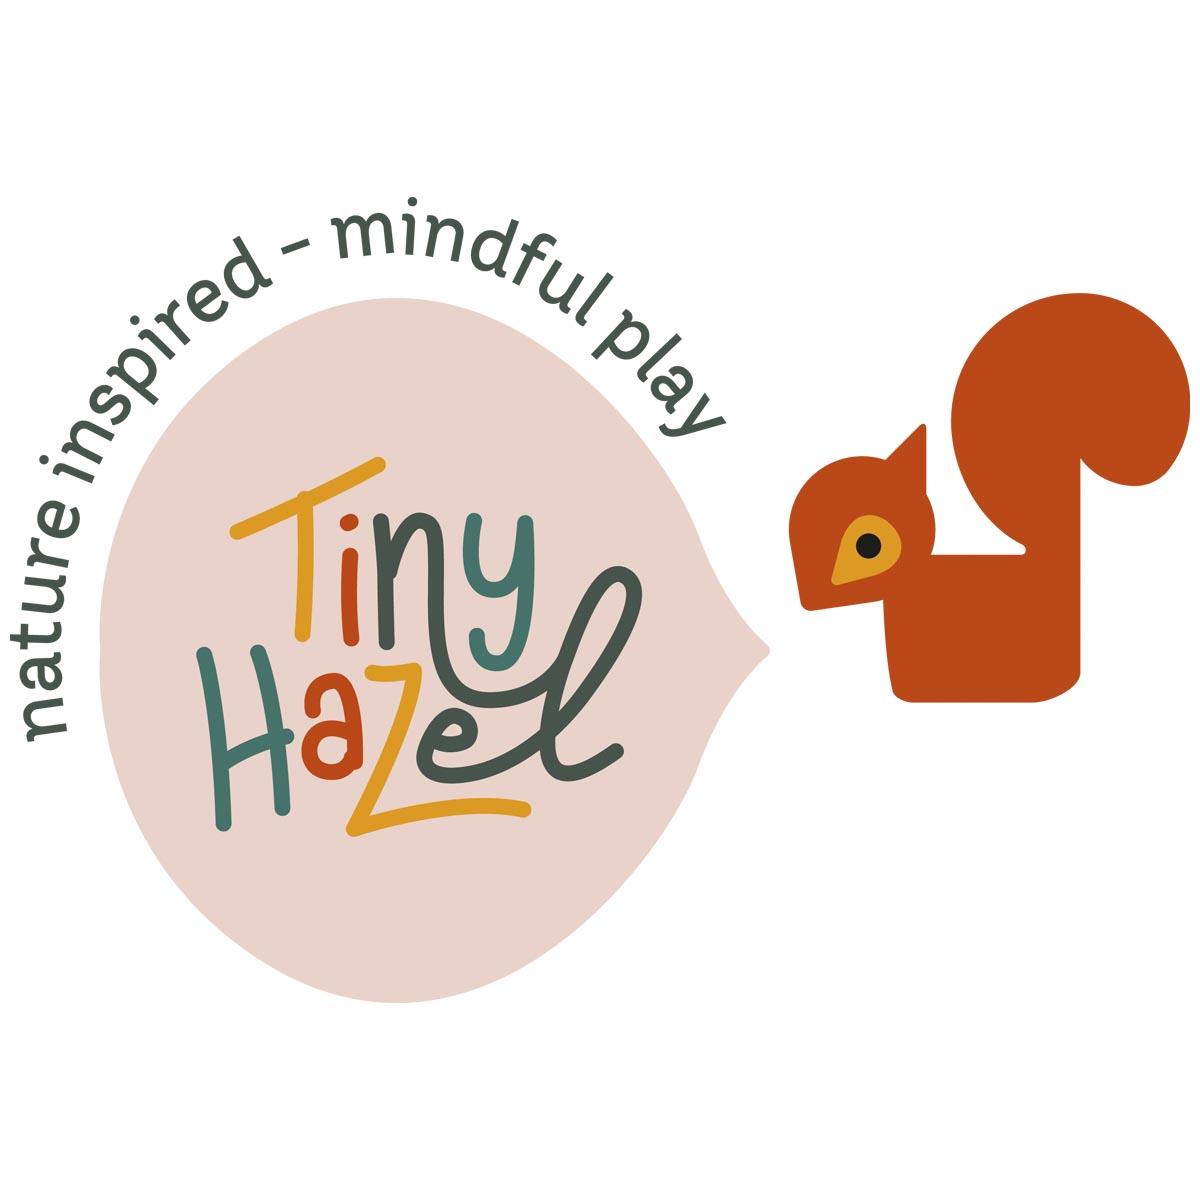 Tiny Hazel Onlineshop für ökologische Kinder